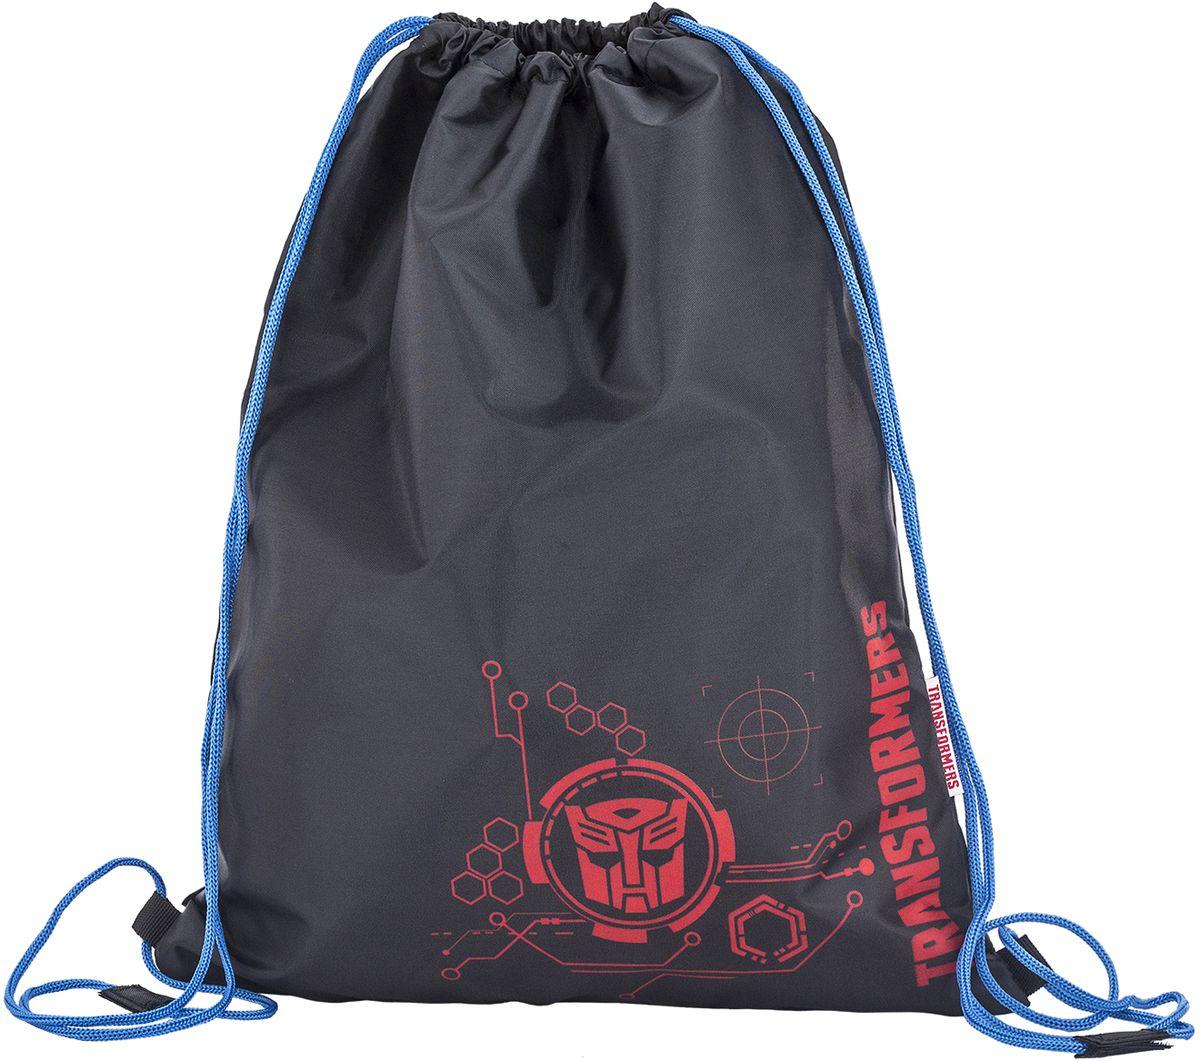 Transformers Сумка для сменной обуви Prime TREB-MT2-883 сумка kinderline international mhbz us1 51box5 v3